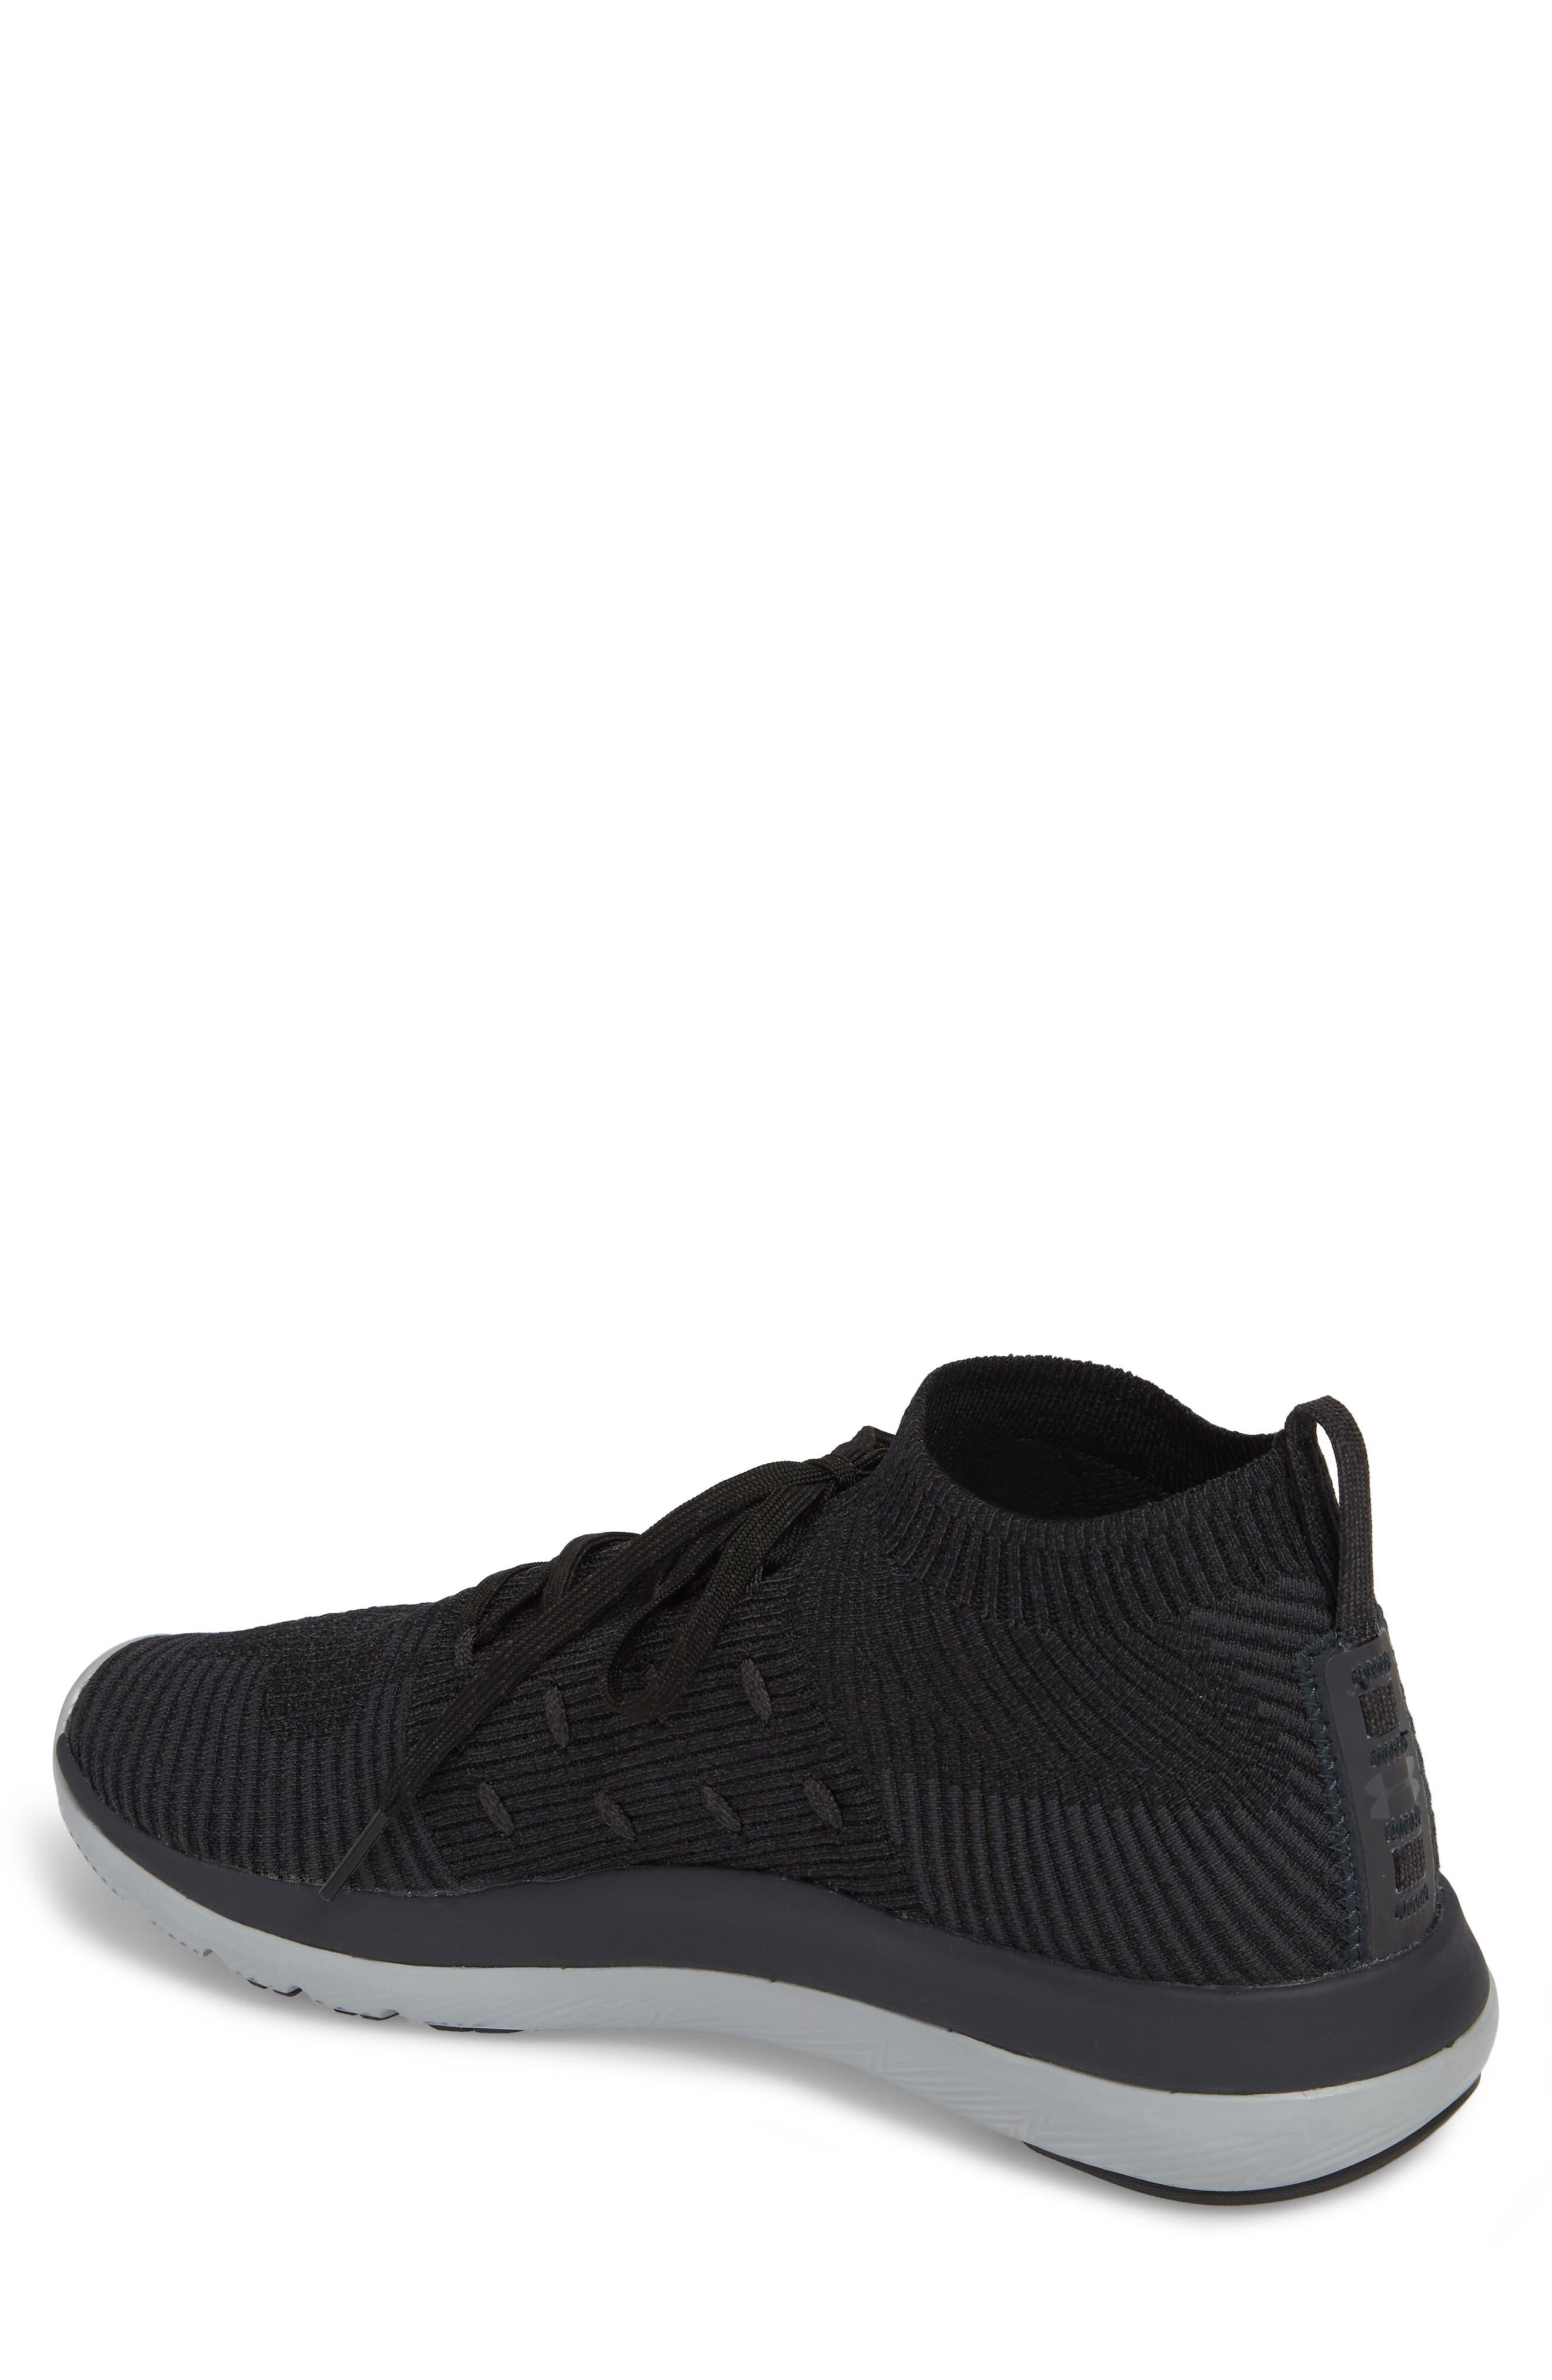 Slingflex Rise Sneaker,                             Alternate thumbnail 2, color,                             BLACK / ANTHRACITE / BLACK